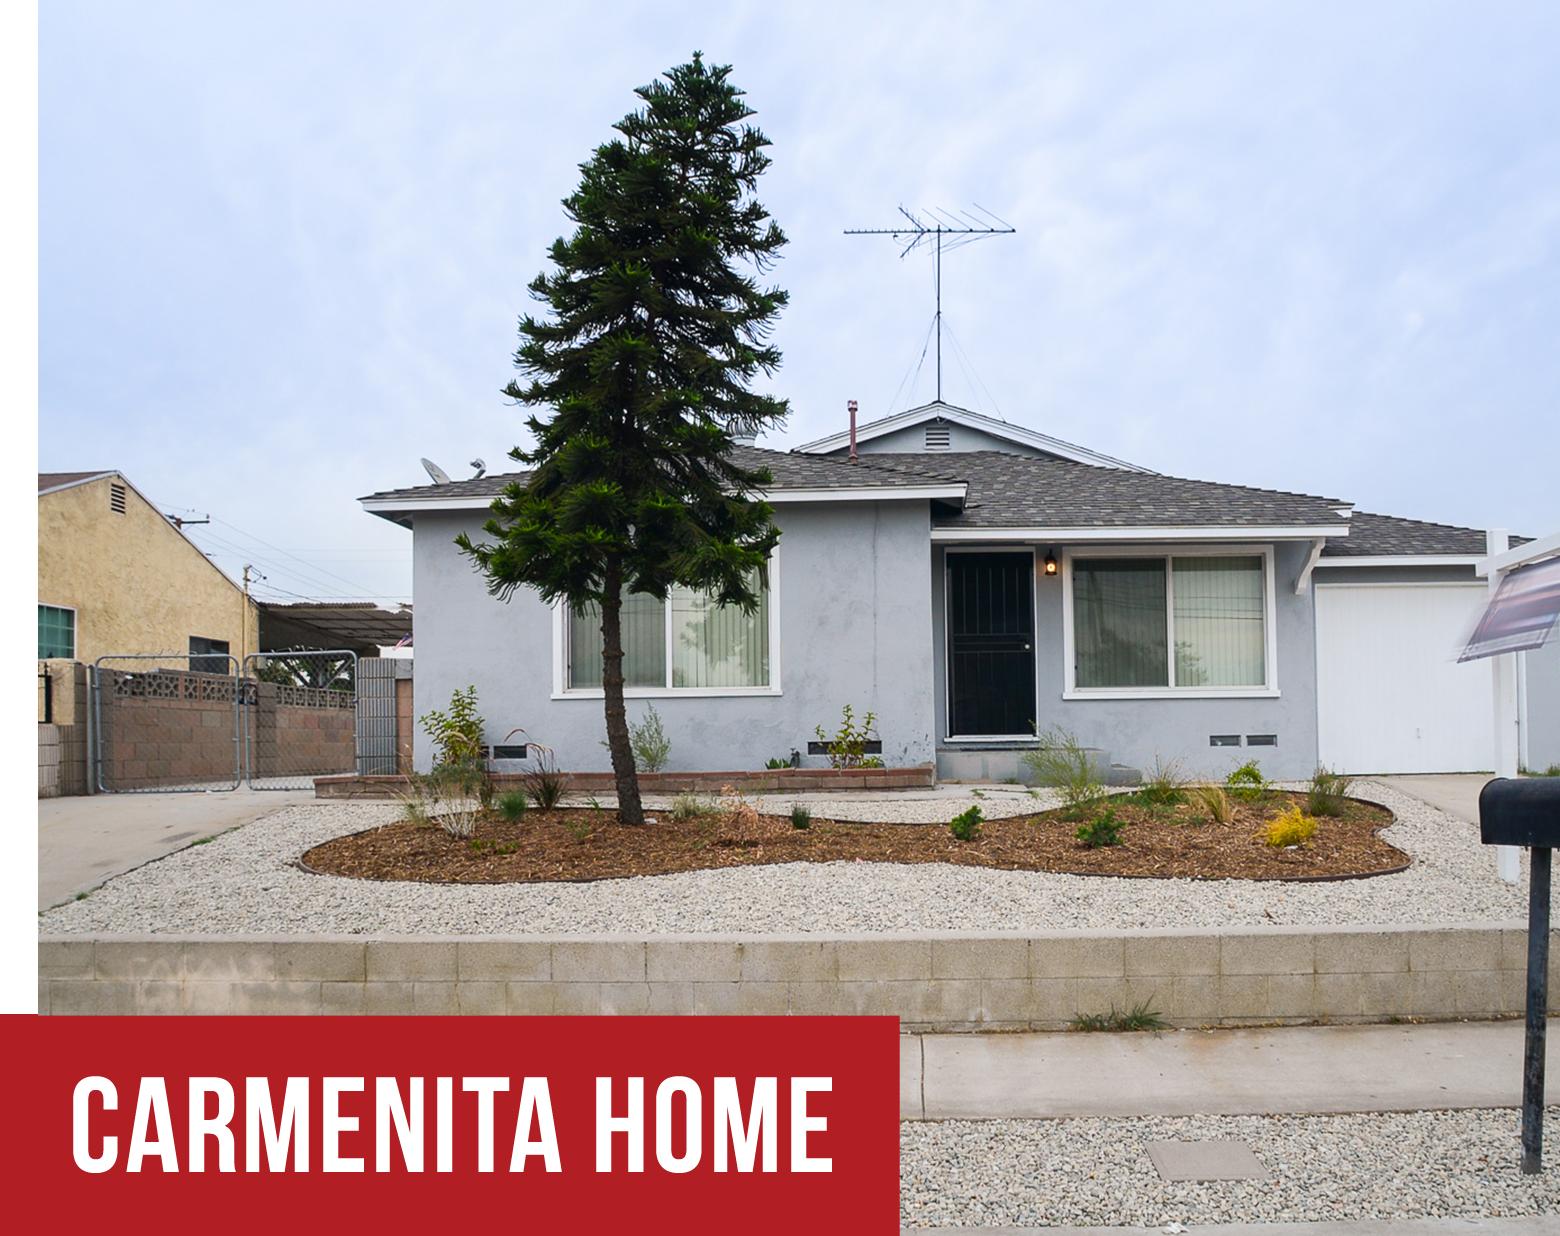 Carmenita Home Transformation